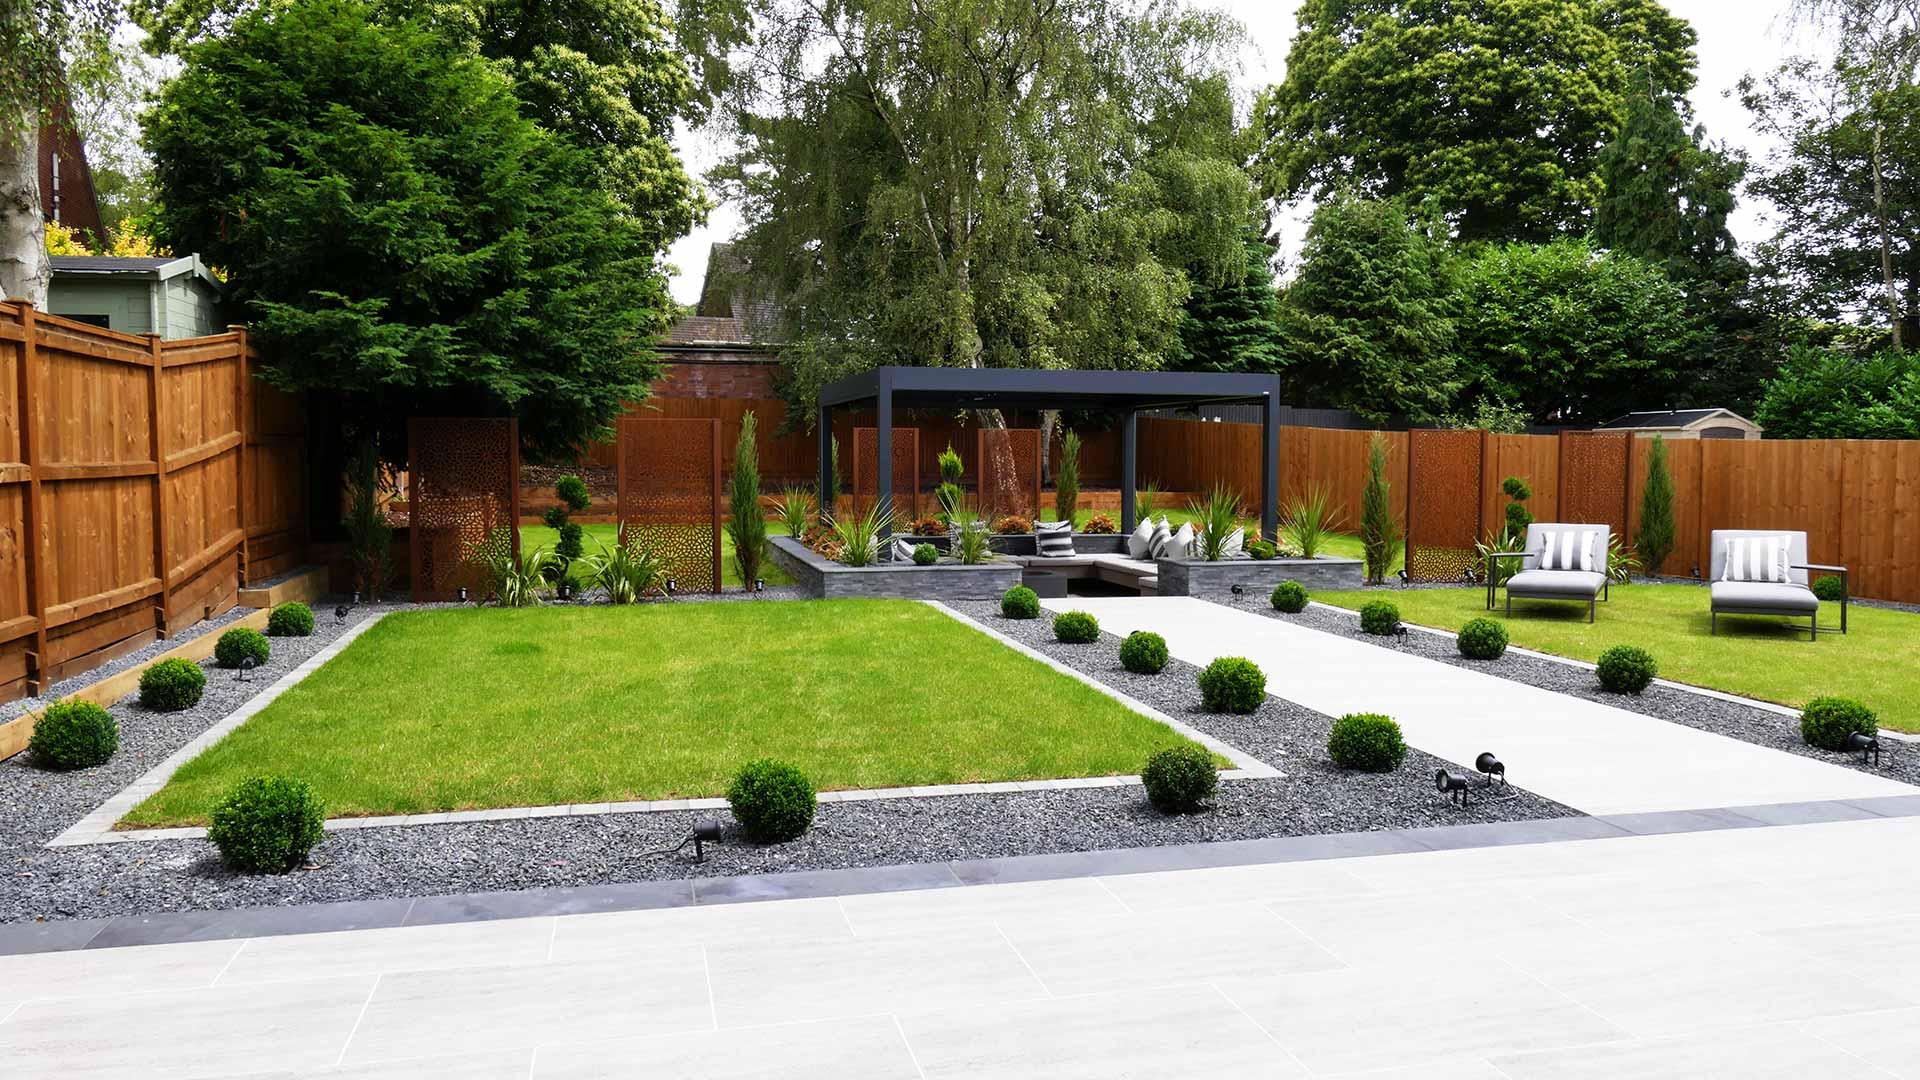 Landscapia Garden Design and Build